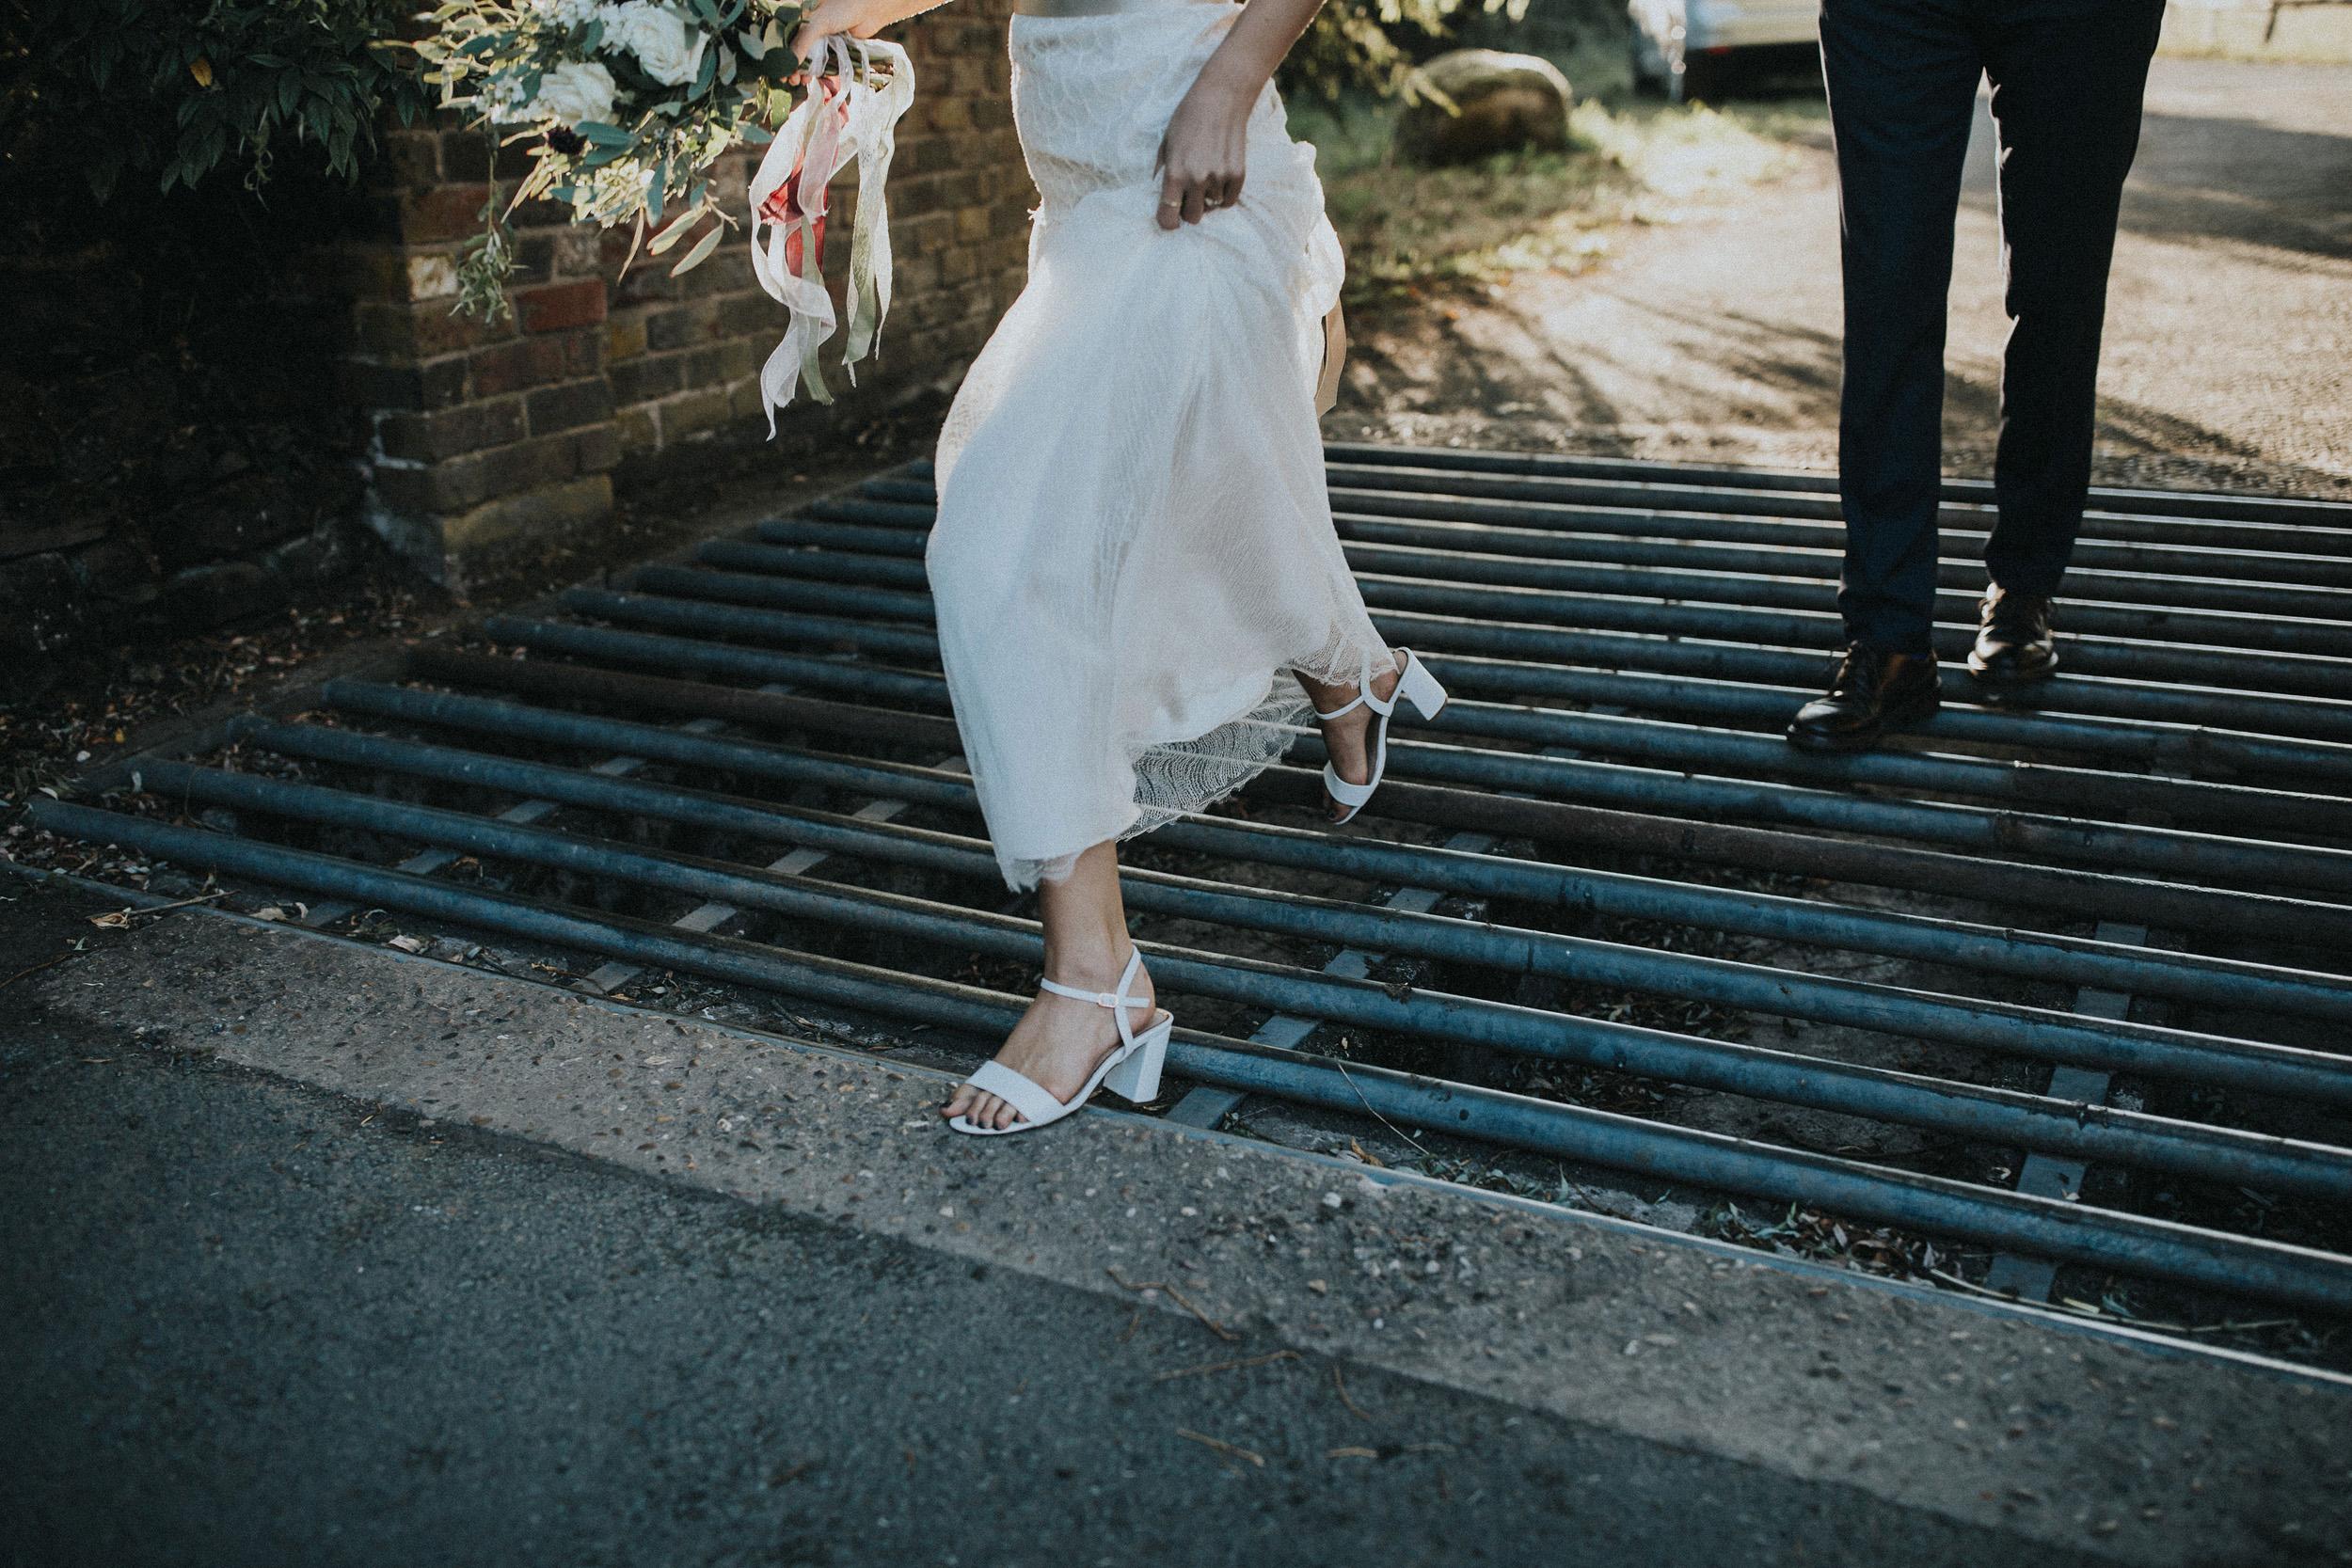 Martha-Laid-Back-Garden-Wedding-Lace-Wedding-Dress-Bohemian-Kate-Beaumont-47.jpg